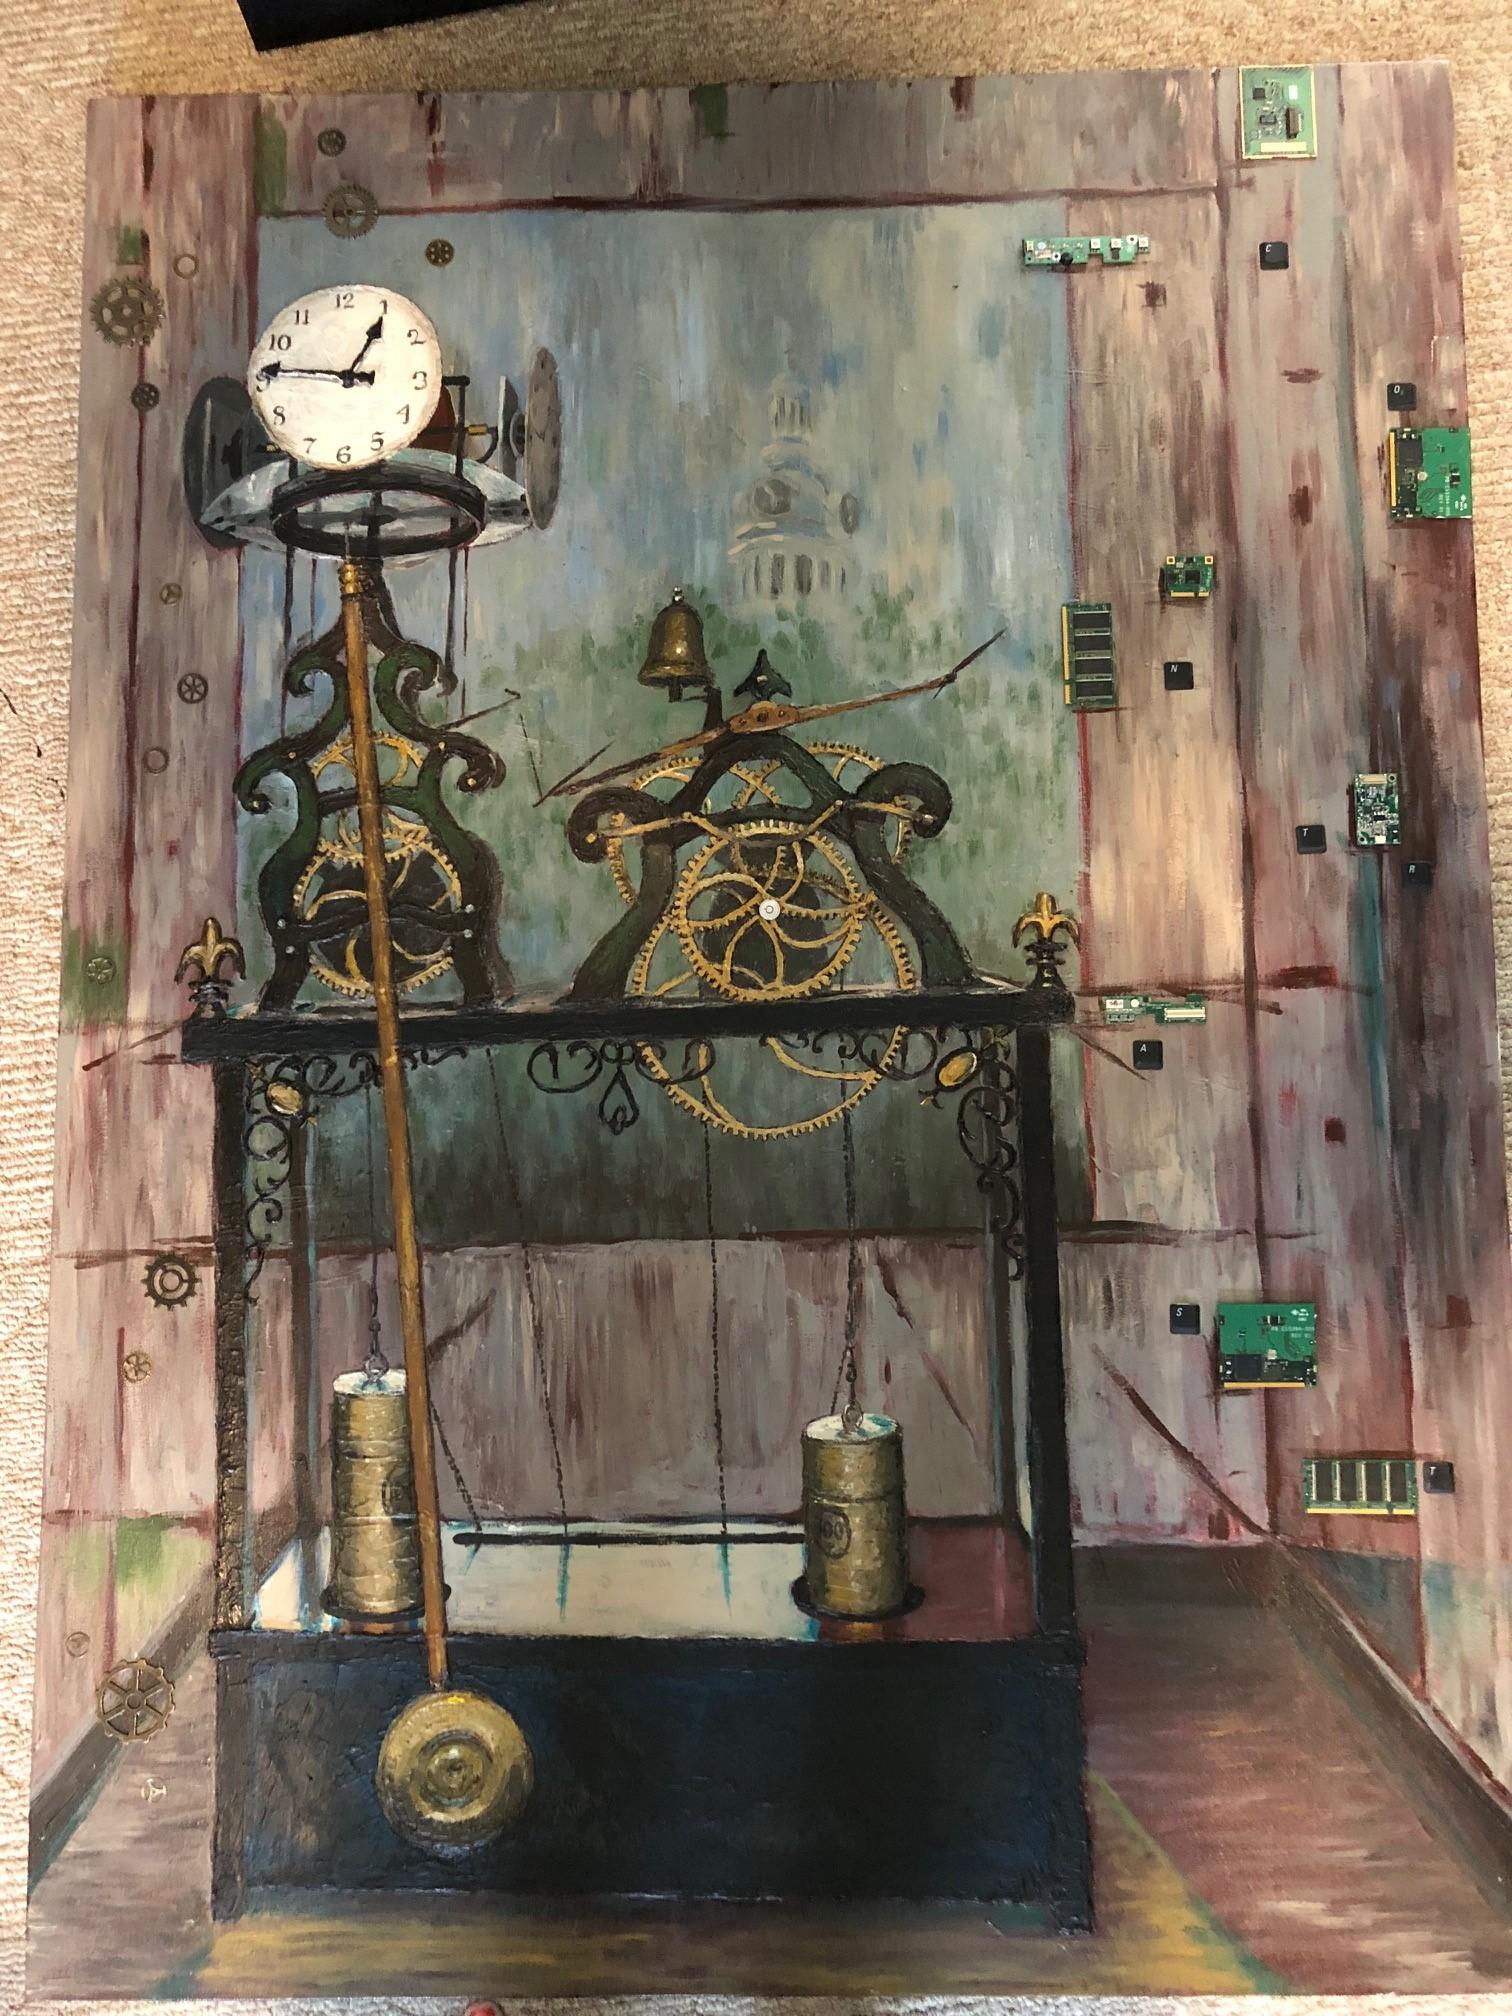 Sculptural Painting Clock Tower